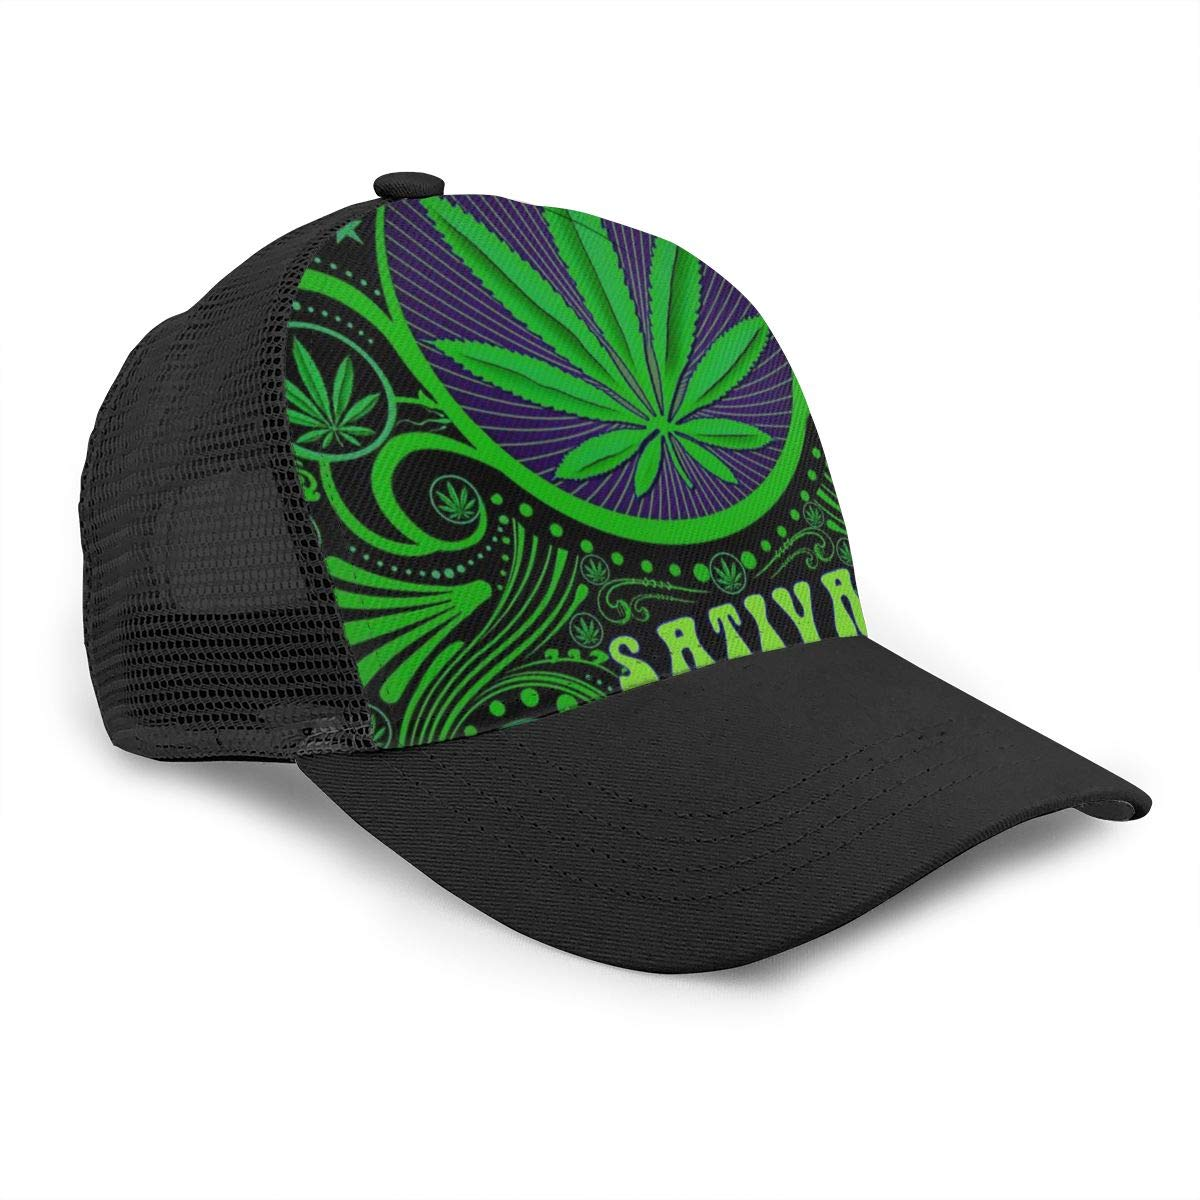 Cannabis Sativa Weed Unisex Mesh Plain Caps Stylish Dad Hat Adjustable Baseball Cap